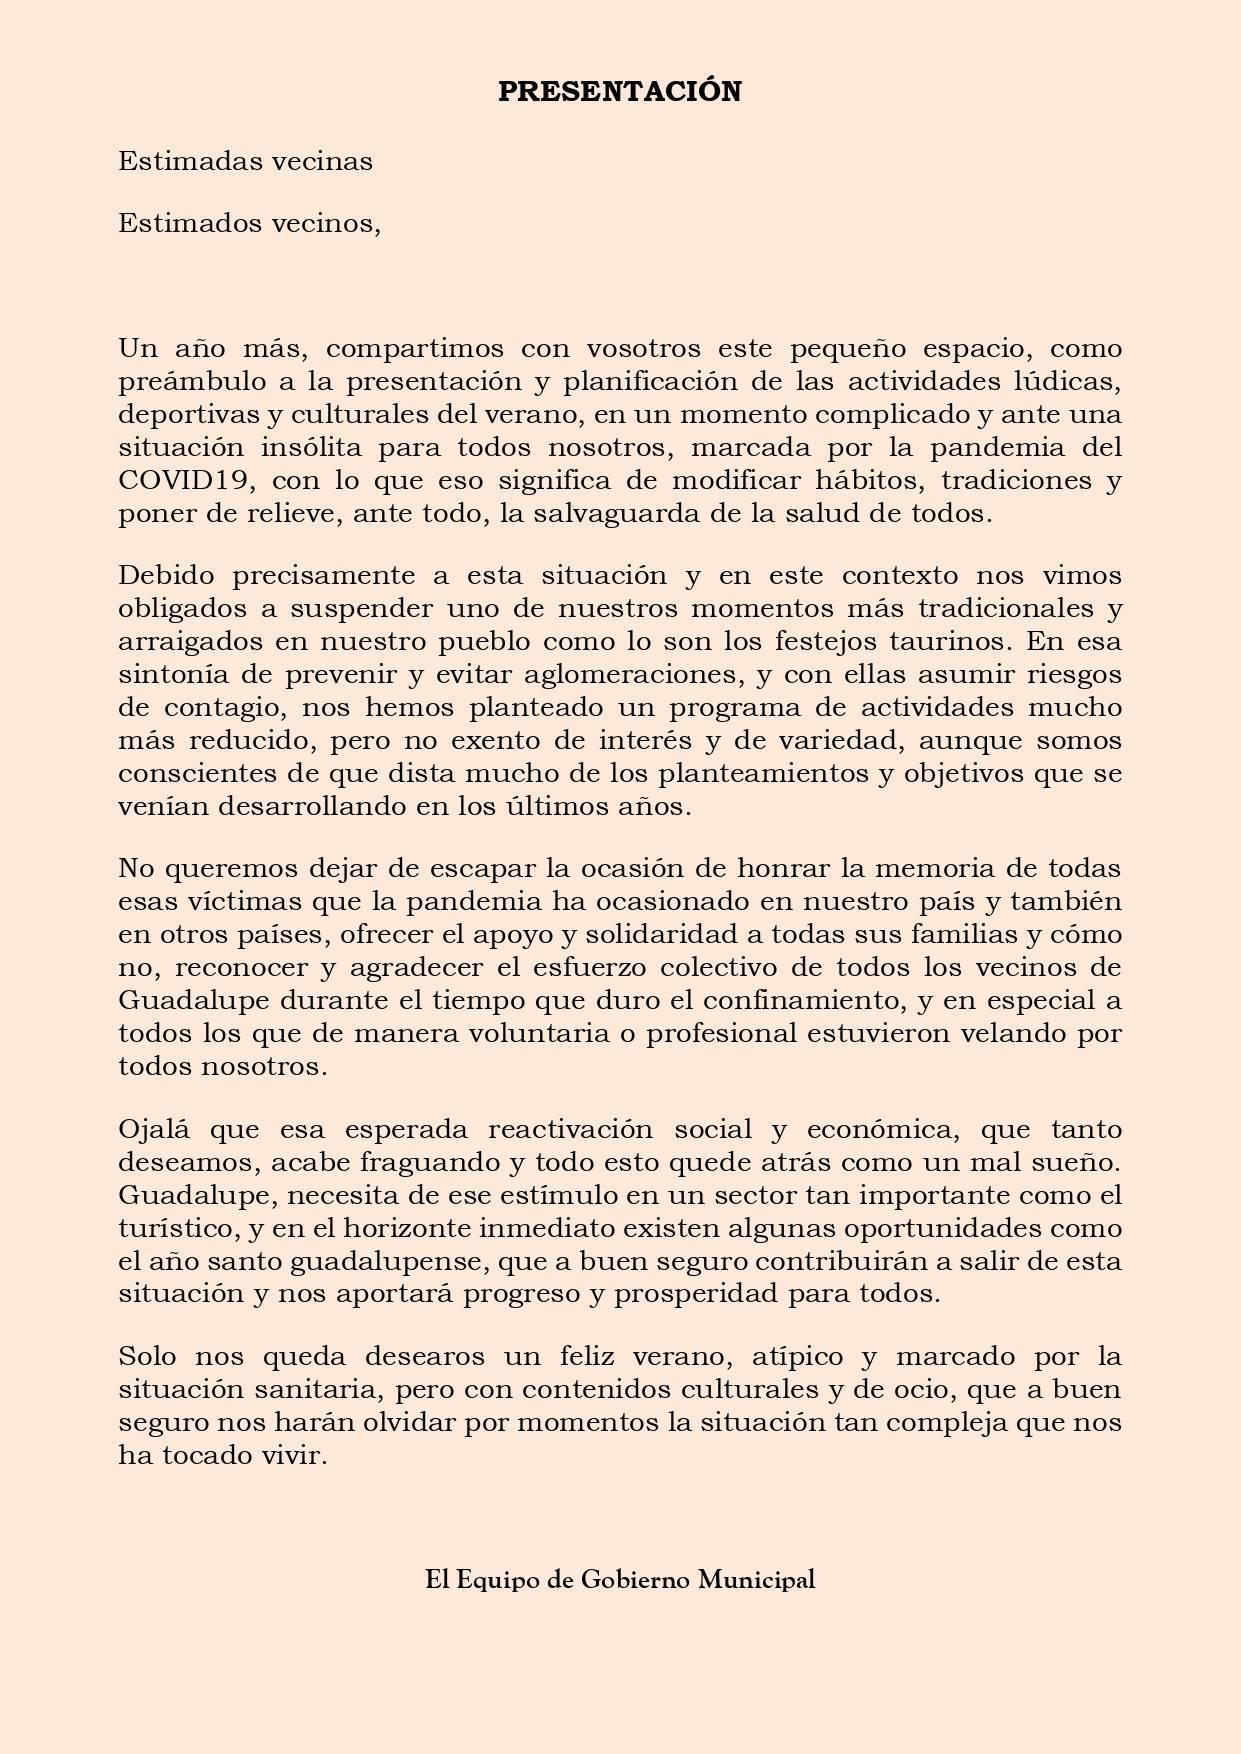 Programa cultural de verano 2020 - Guadalupe (Cáceres) 2